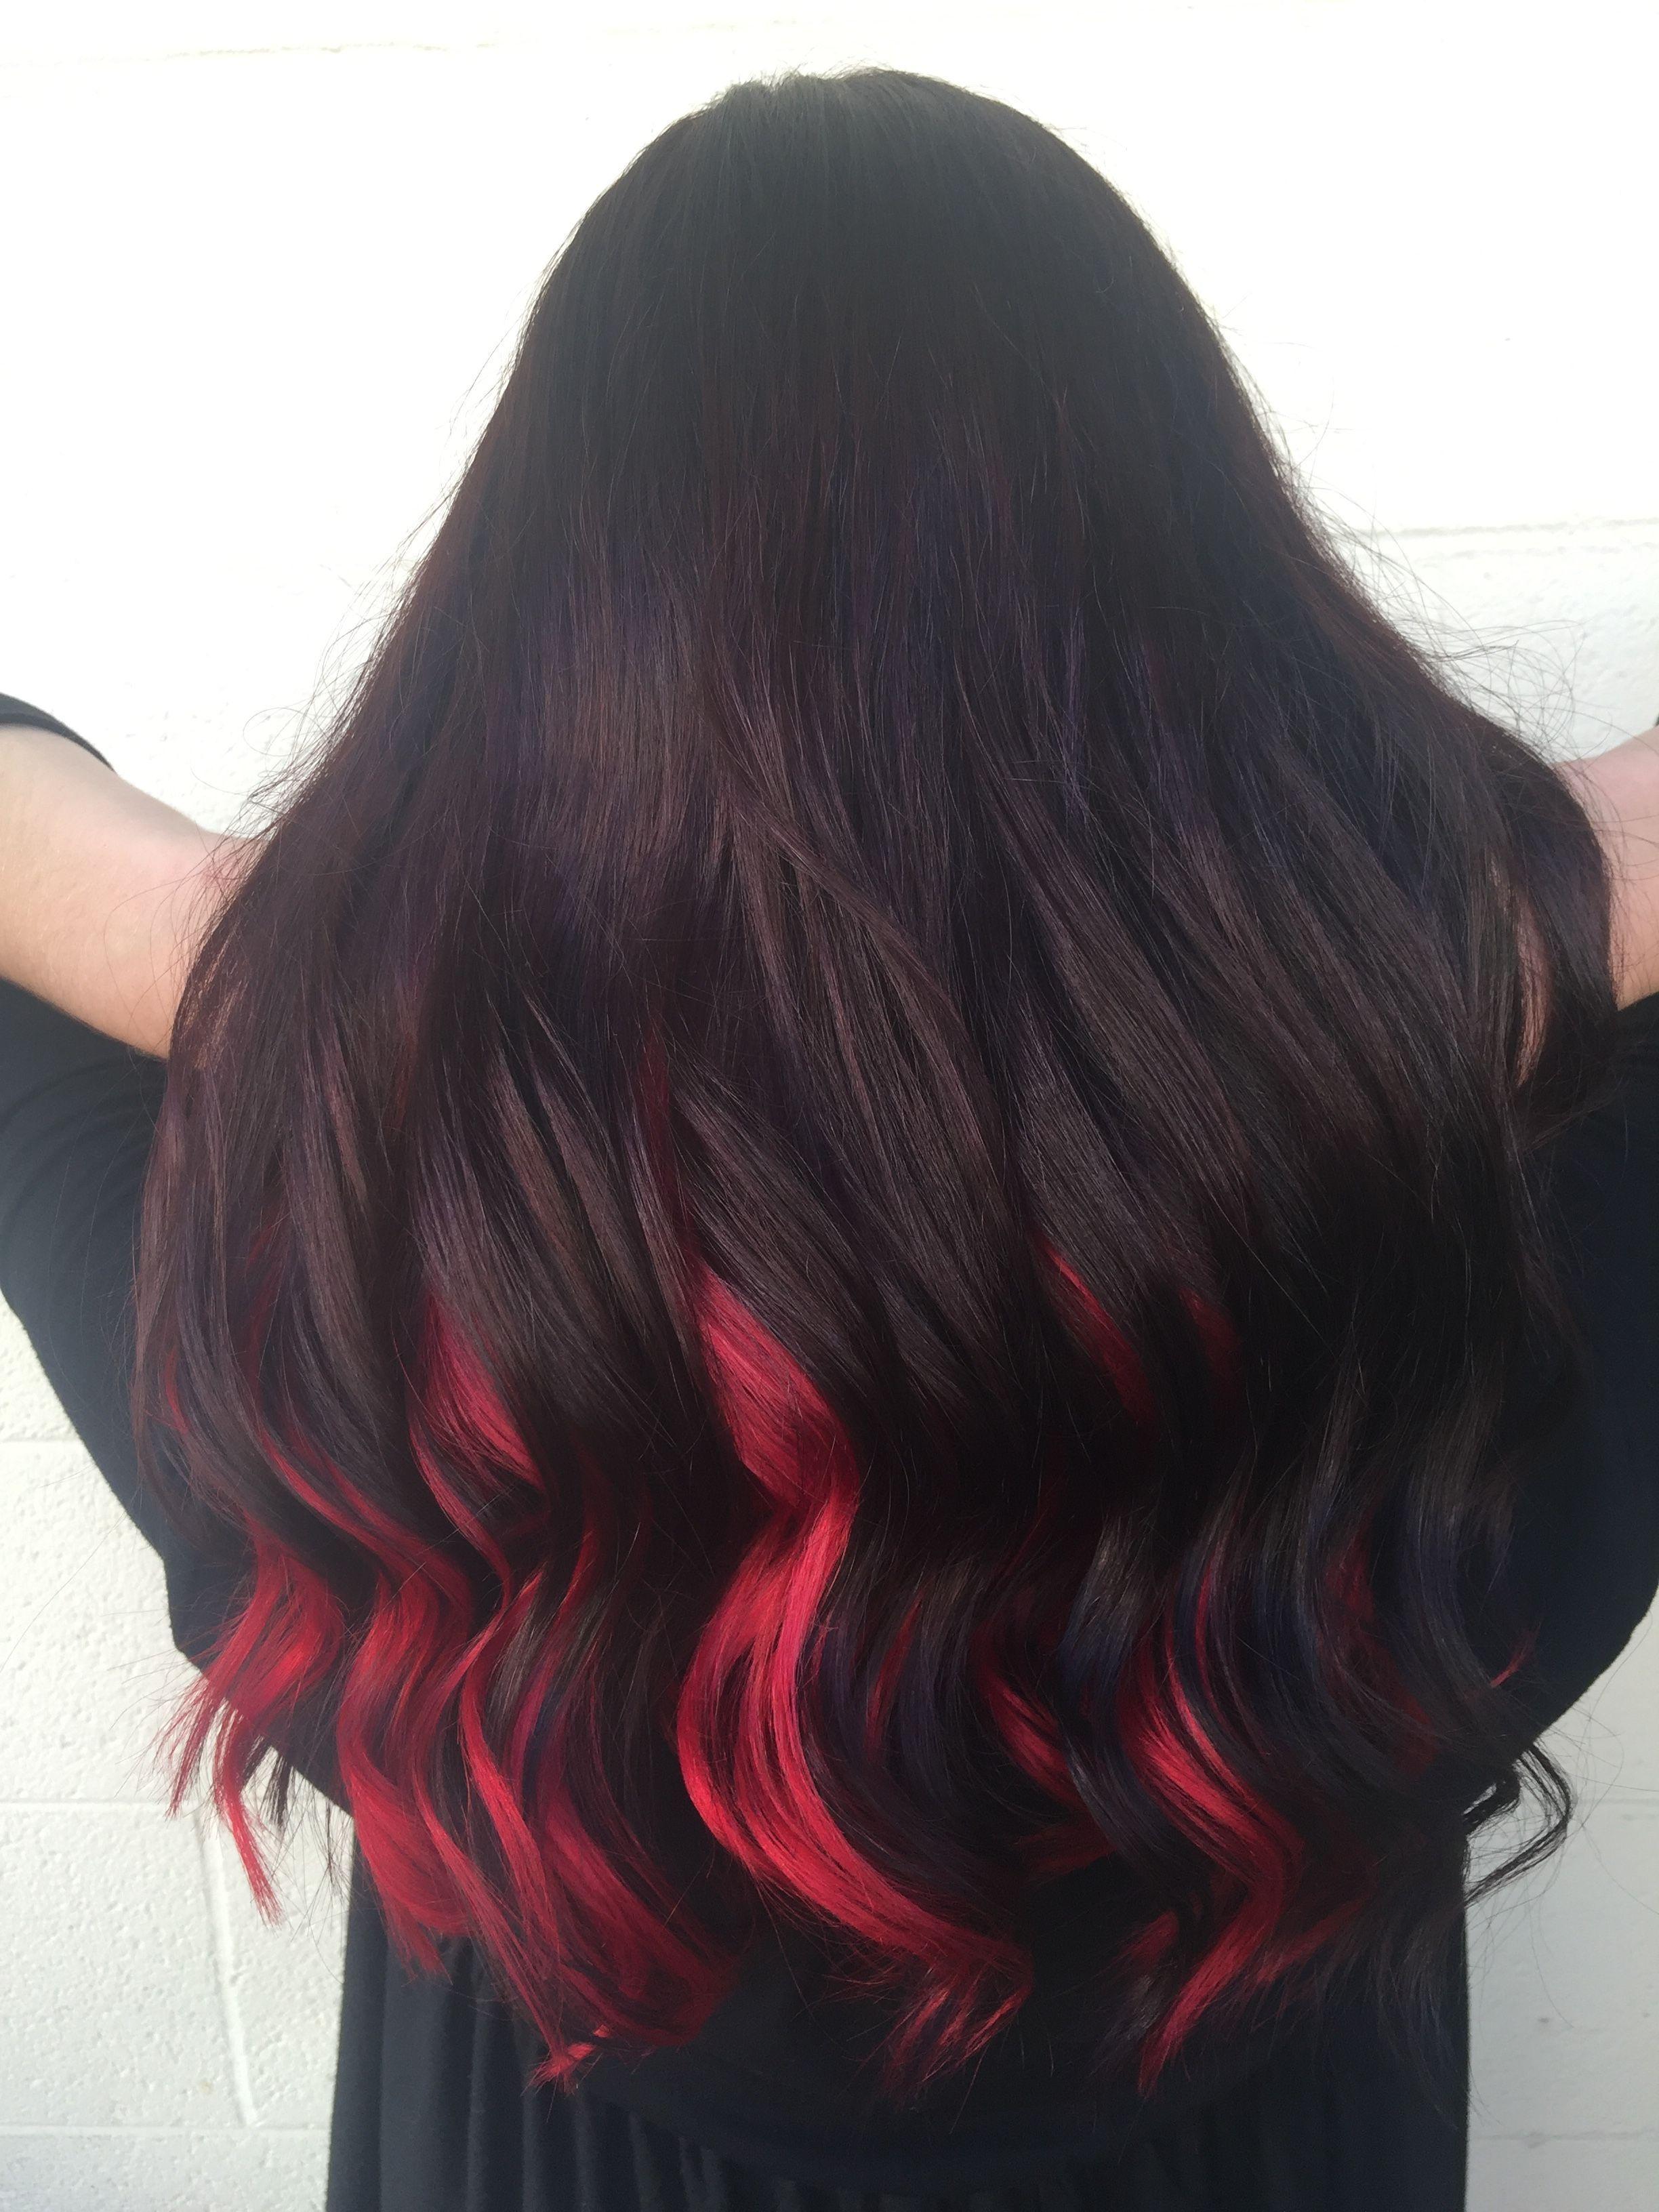 Dark Red Brunette Bright Pravana Red Underneath Fall Hair Matrix Color Savys Dark Red Br In 2020 Black Red Hair Red Hair Underneath Hair Color For Black Hair